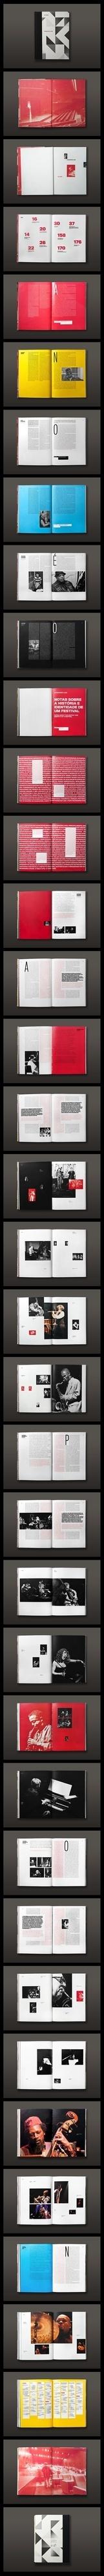 Jazz 20 Year Edition Book #year #edition #jazz #book #20